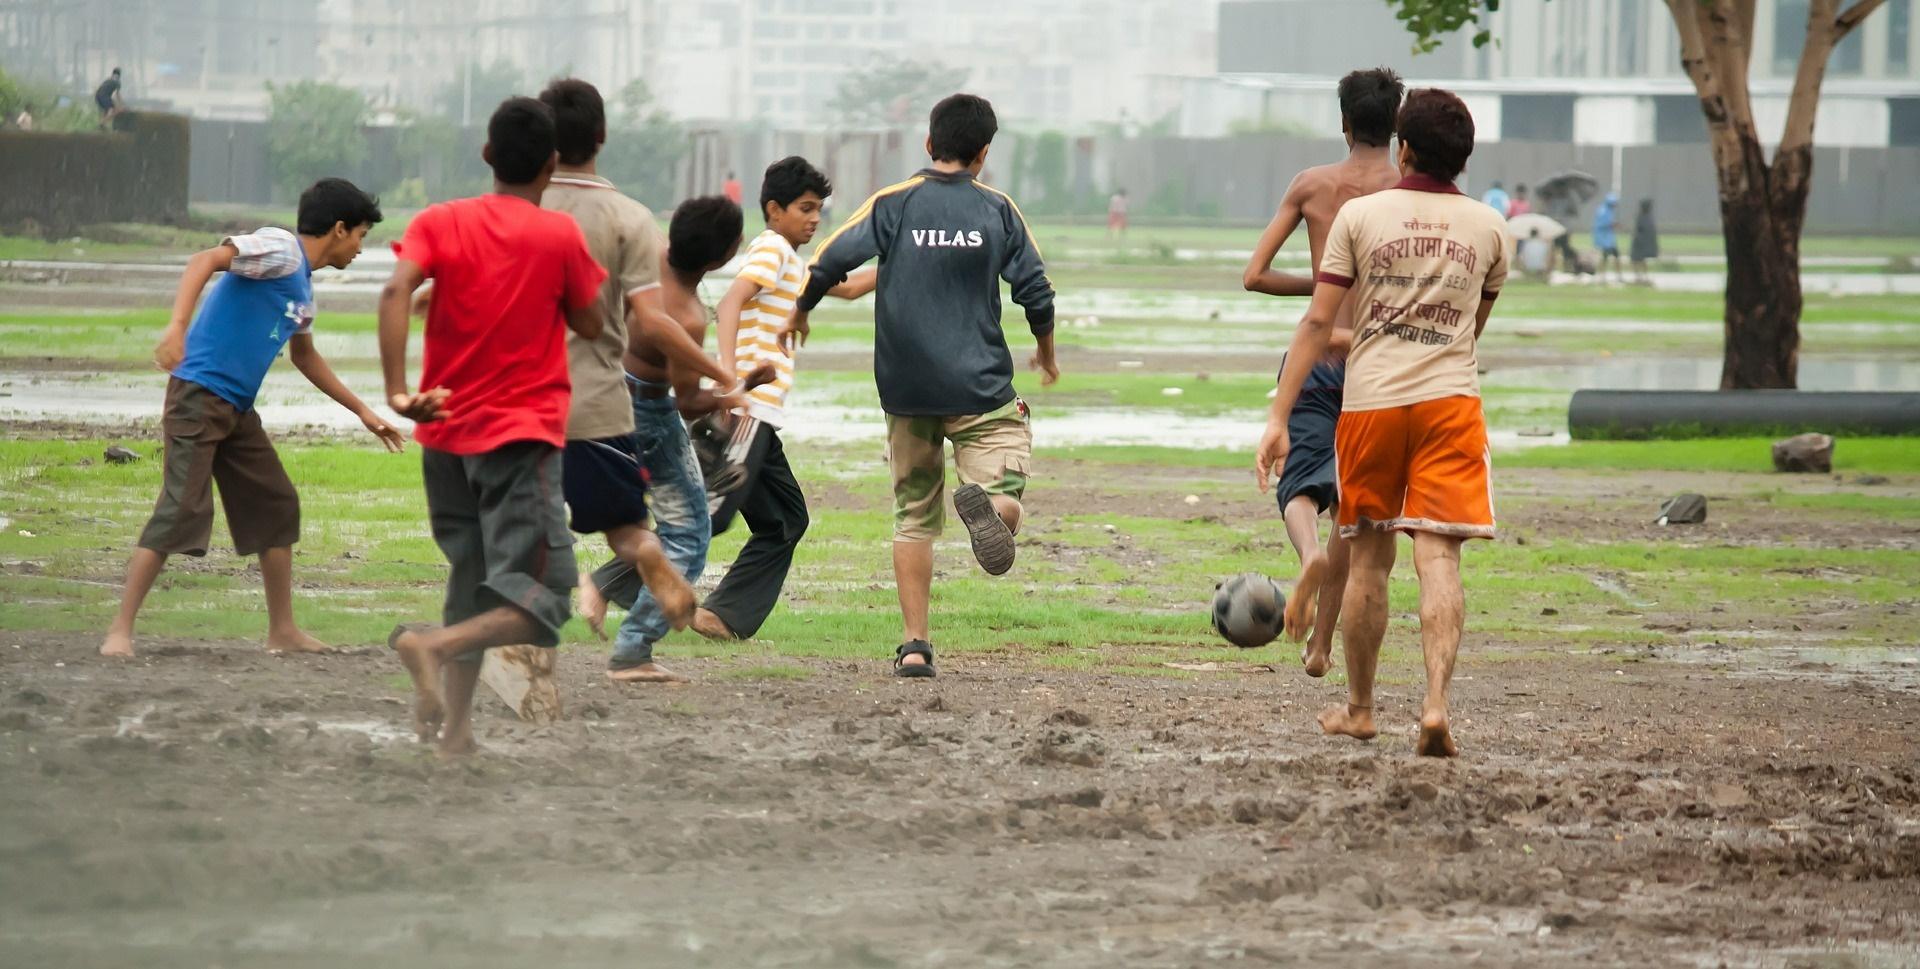 Football PDpics via Pixabay CC licensing